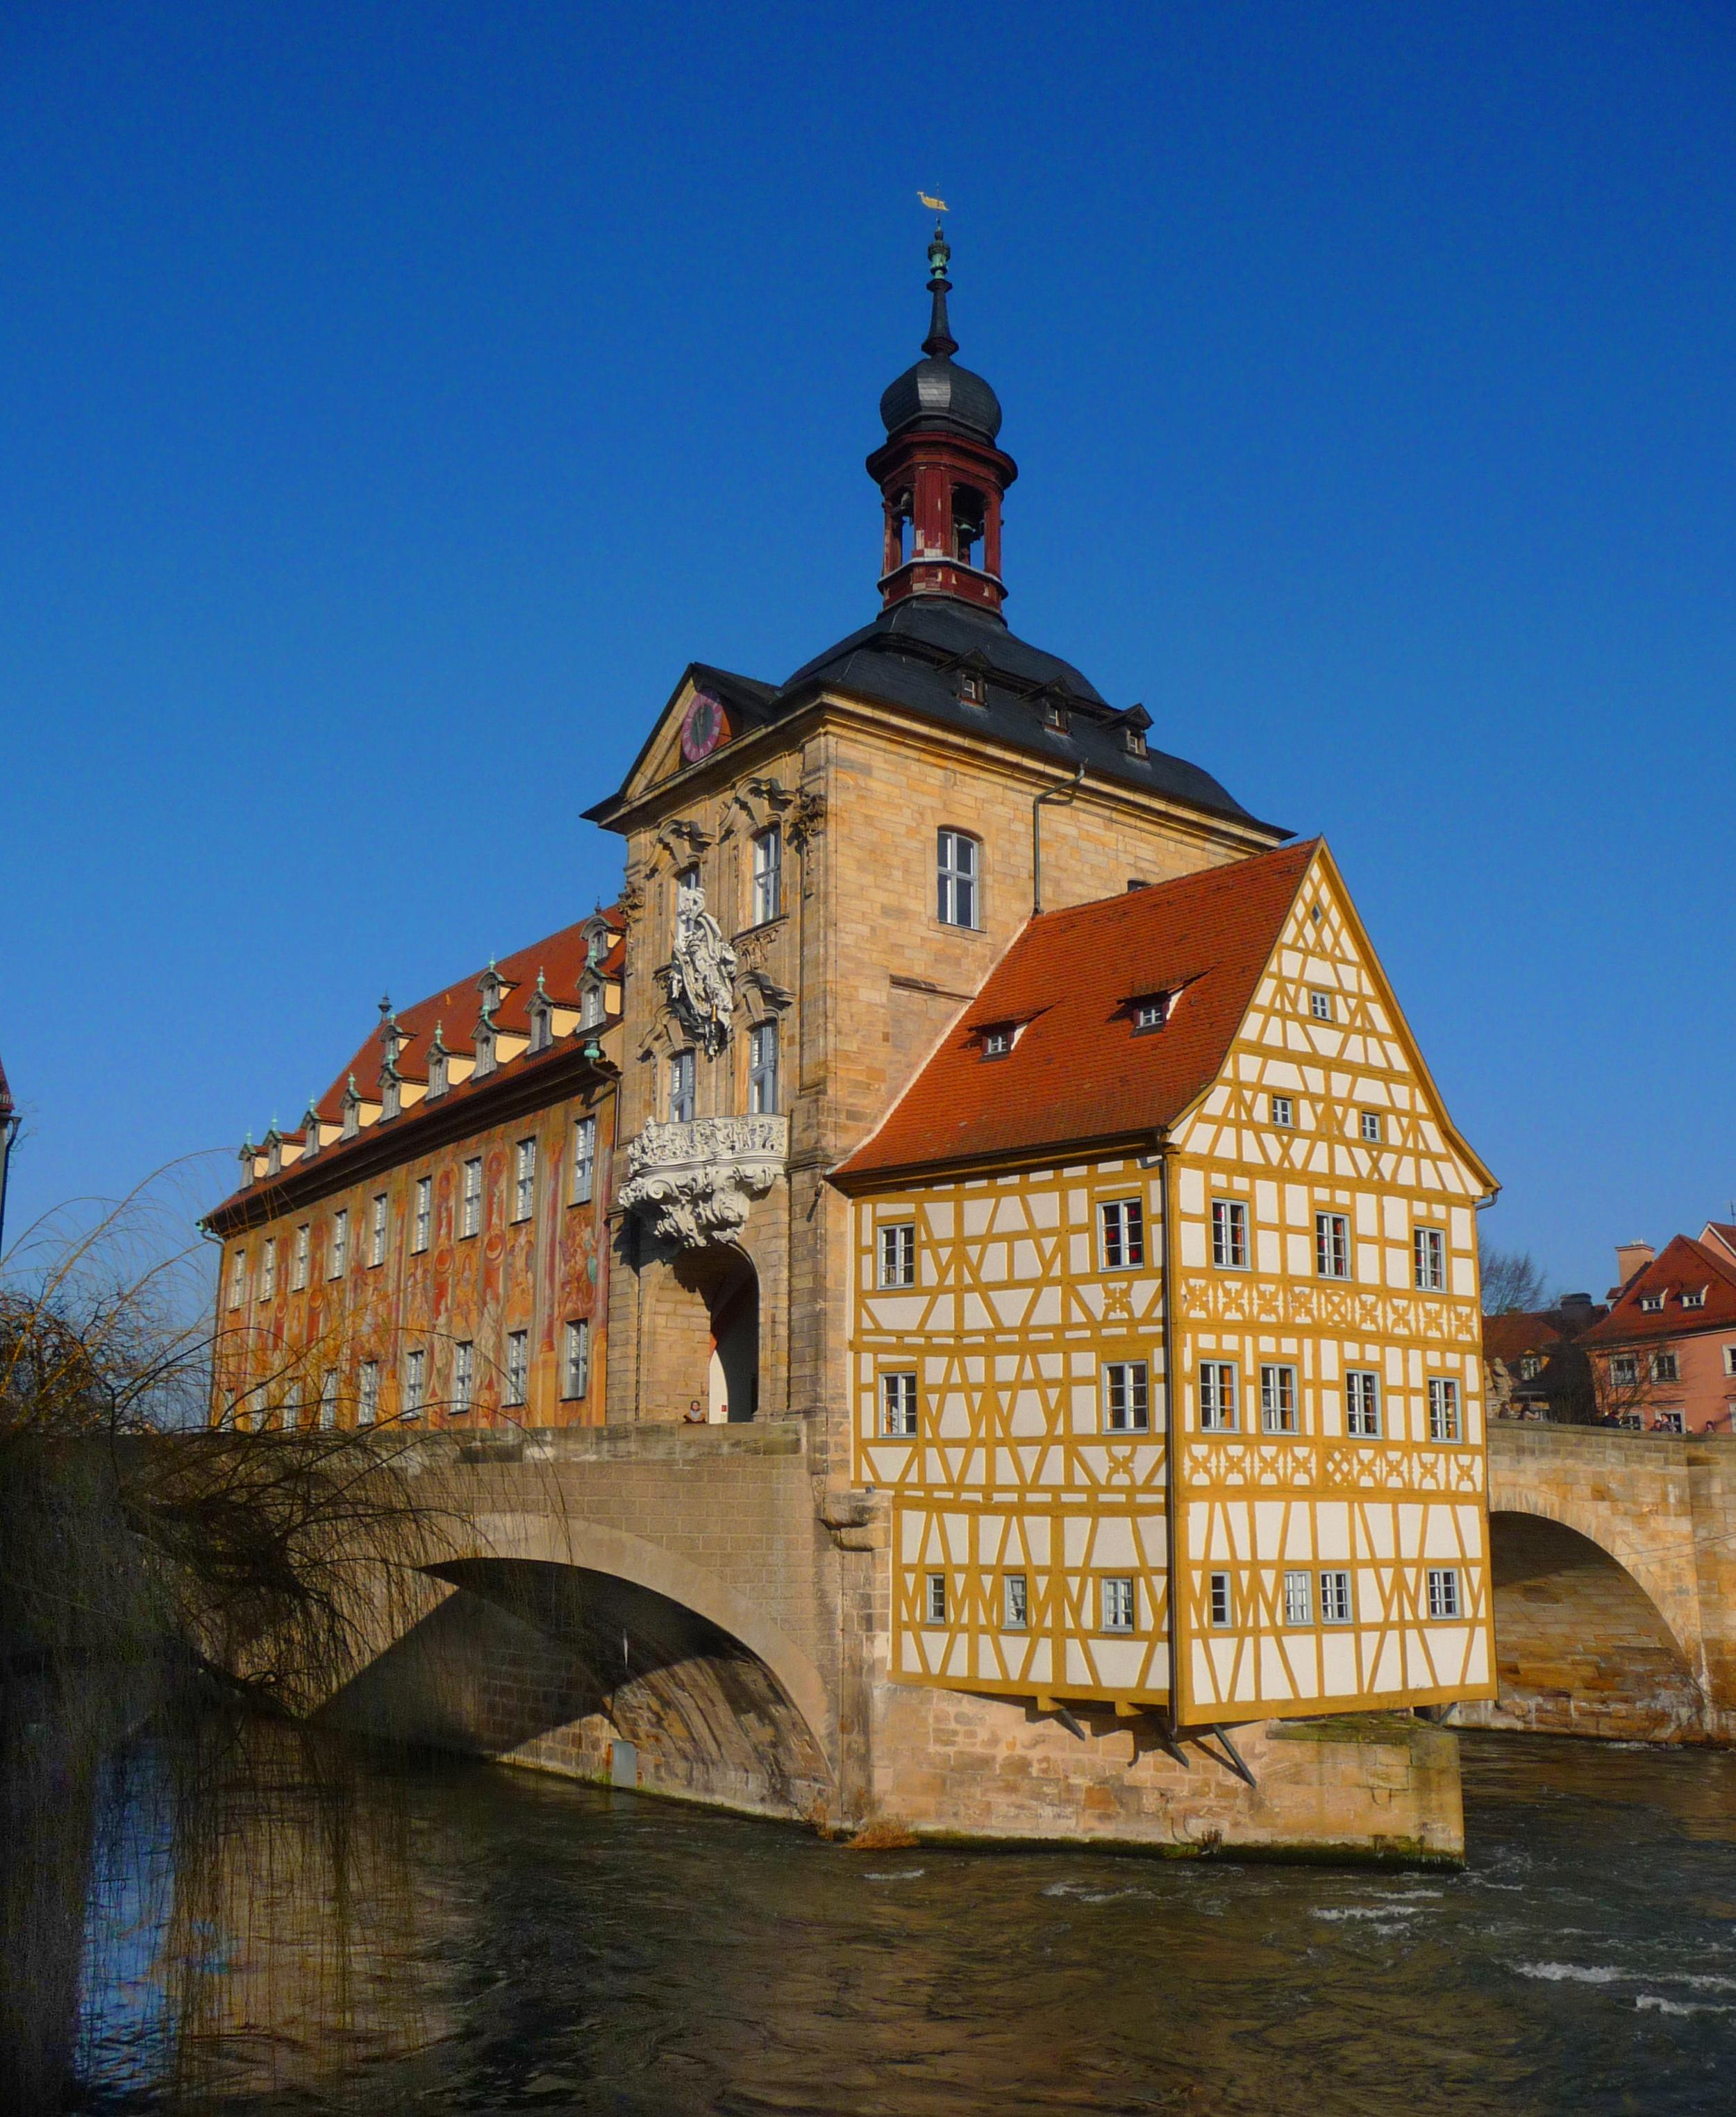 1467; rebuiltn 1754-1756 by Jakob Küchel (photo:Wikimedia Commons)